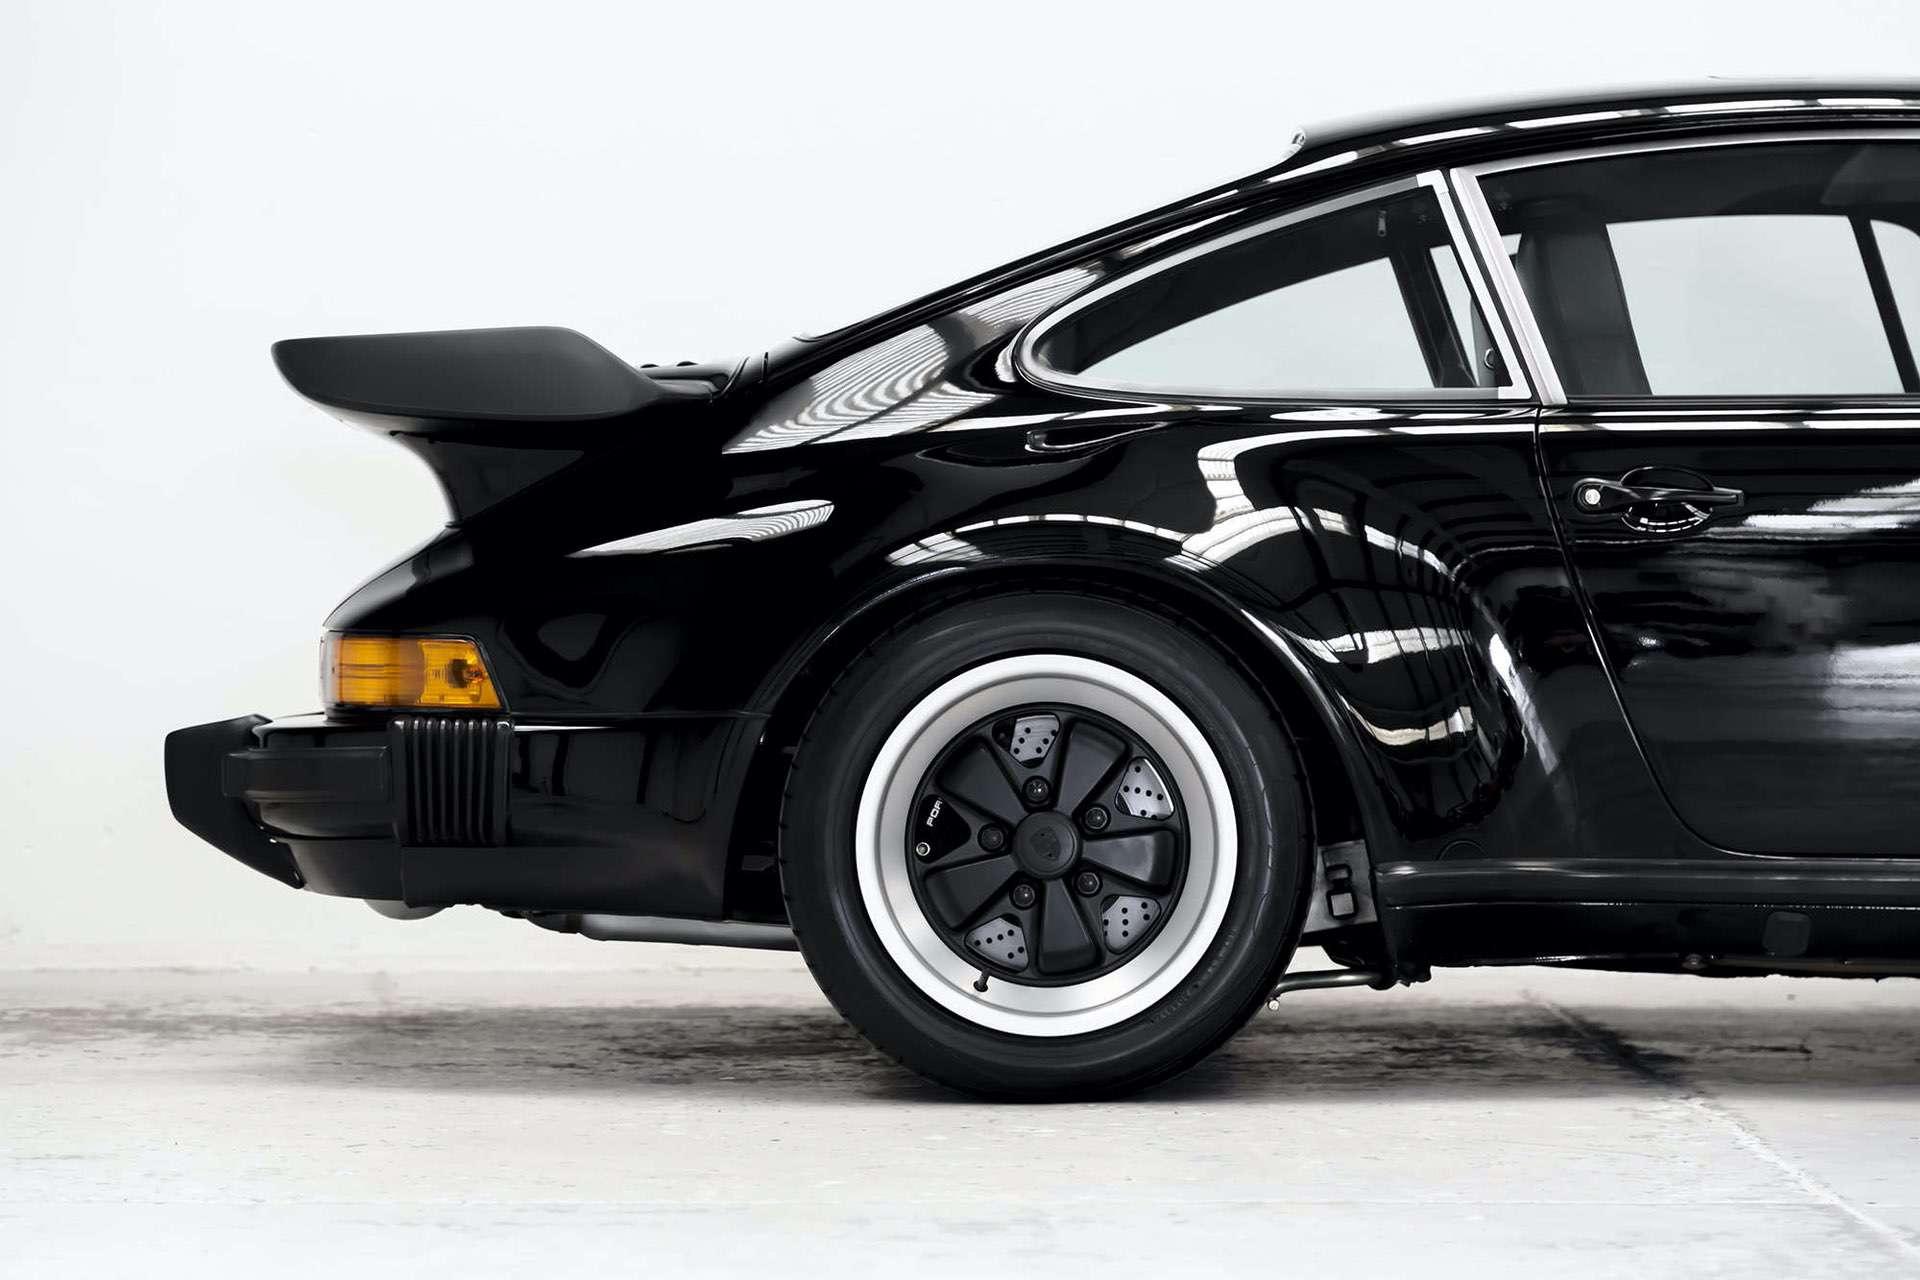 Porsche_911_930_Turbo_0010